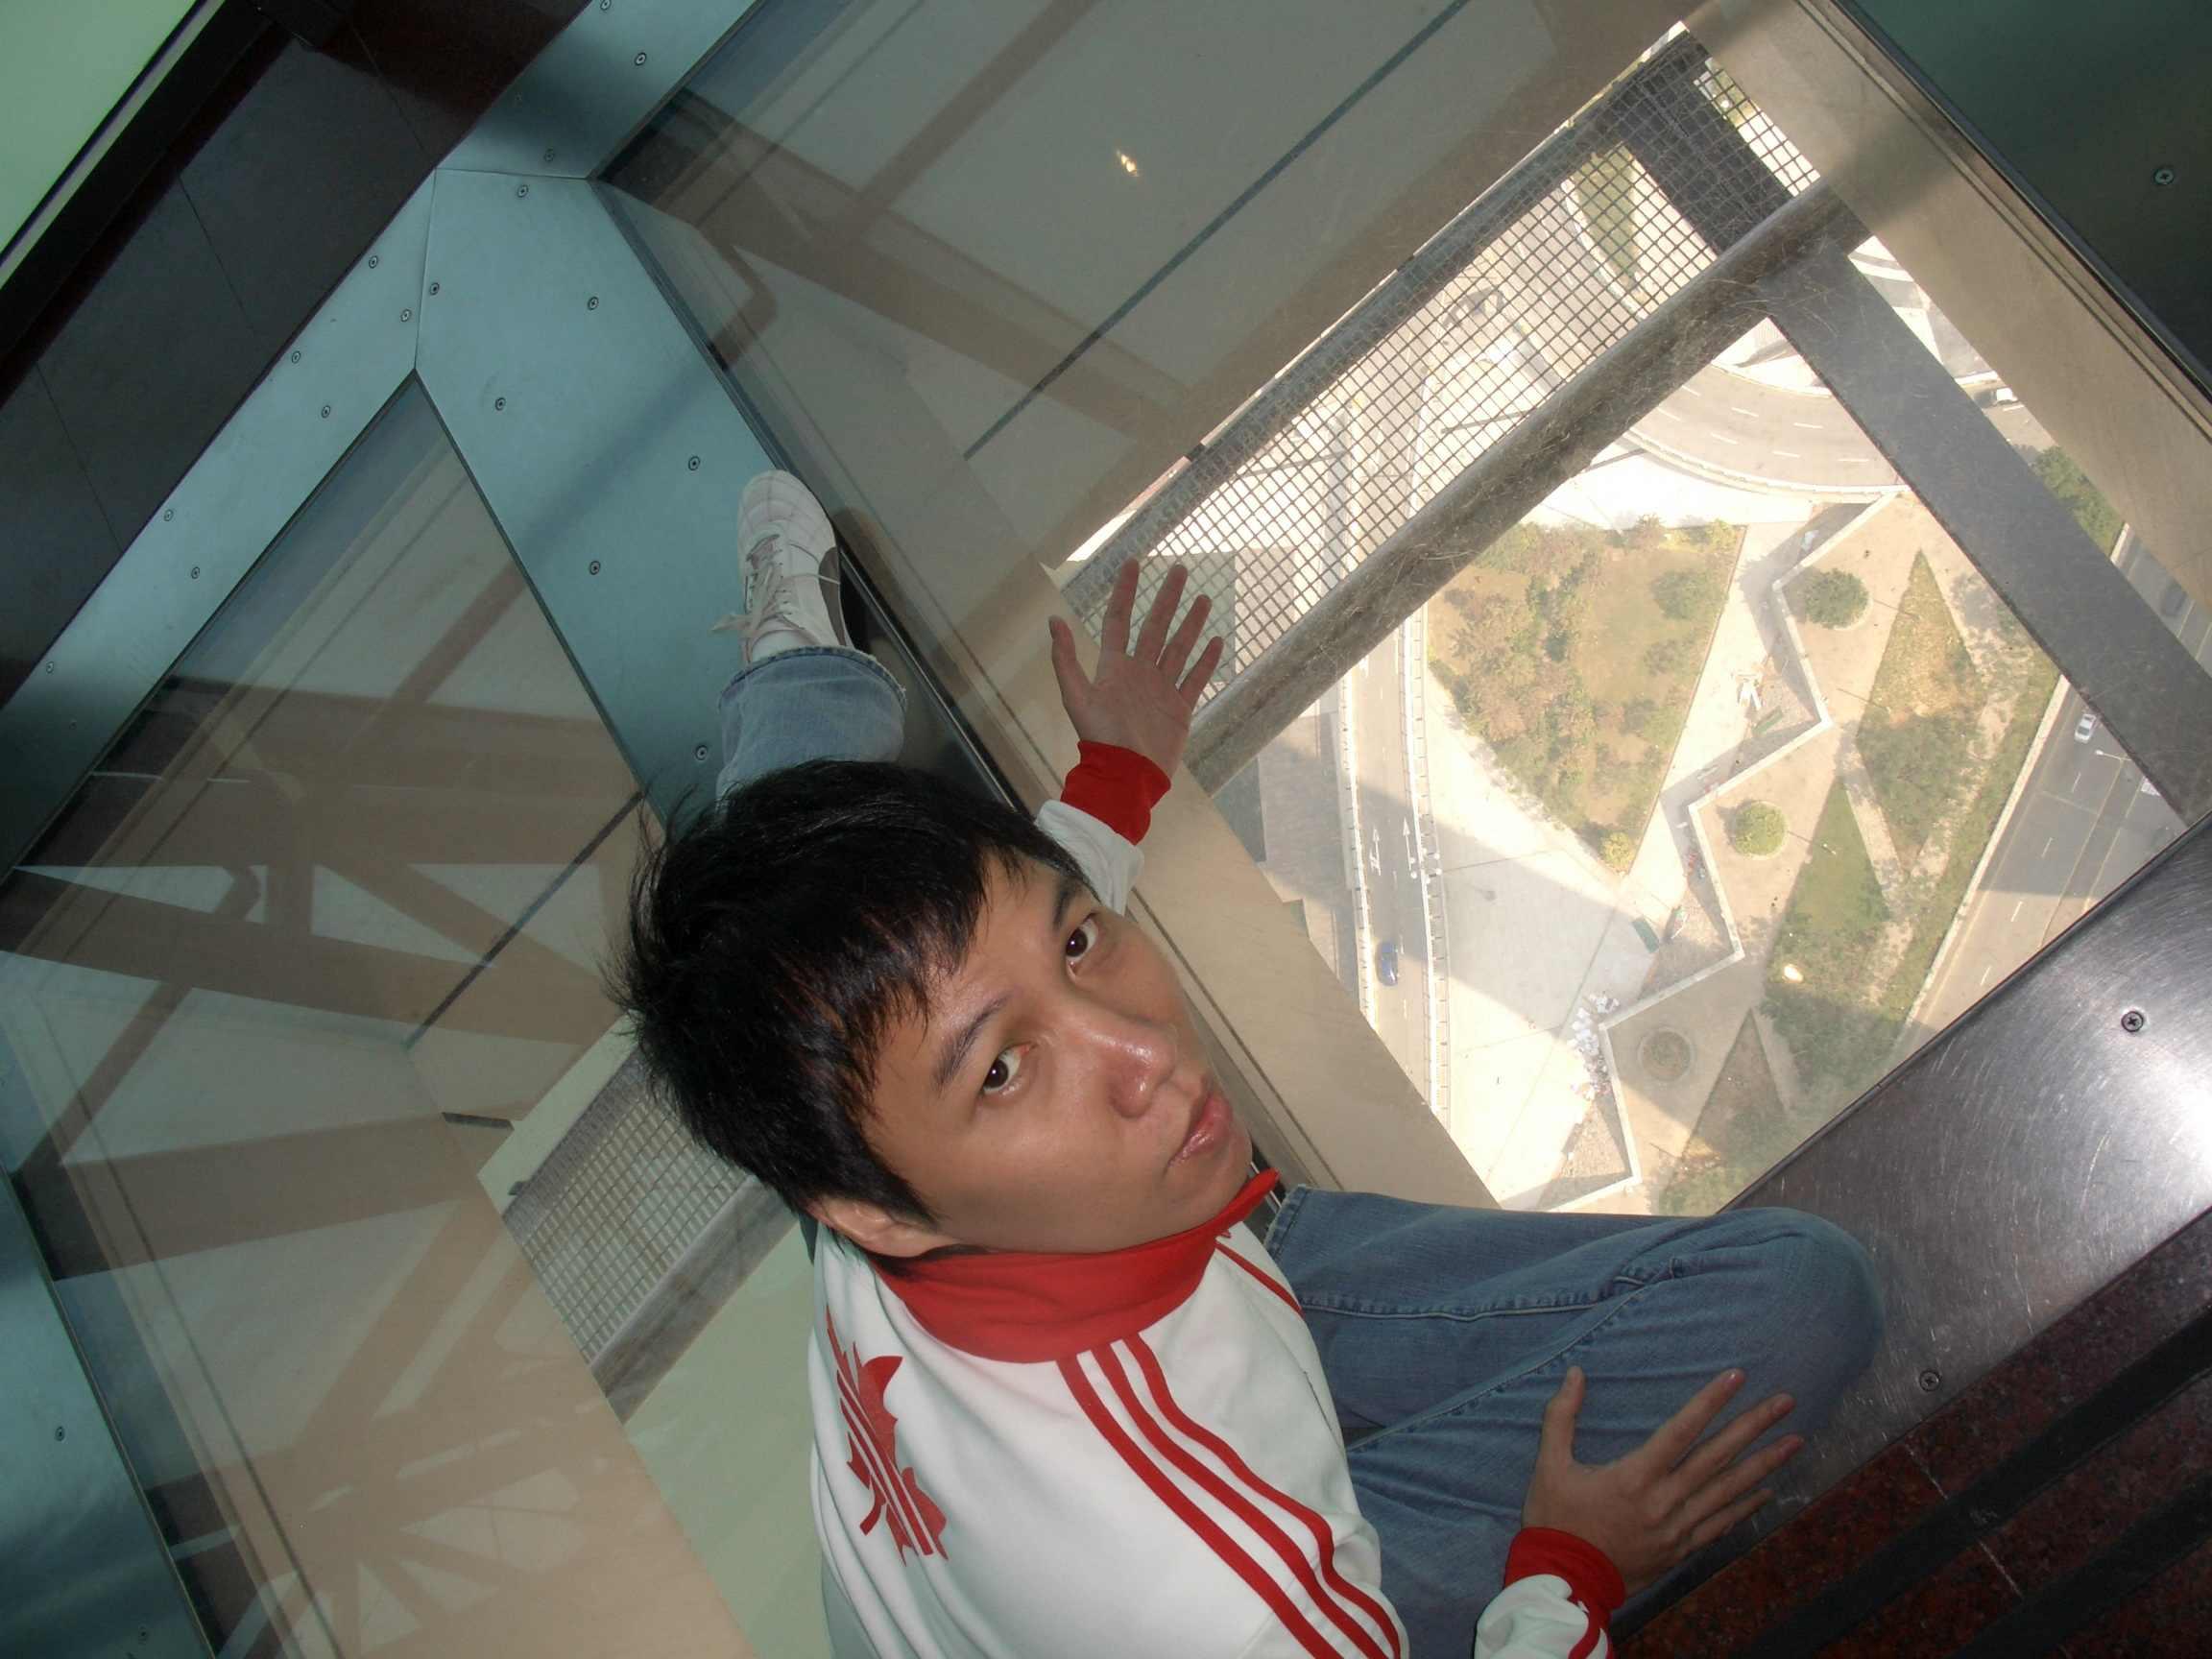 myself on the macau tower glass floor